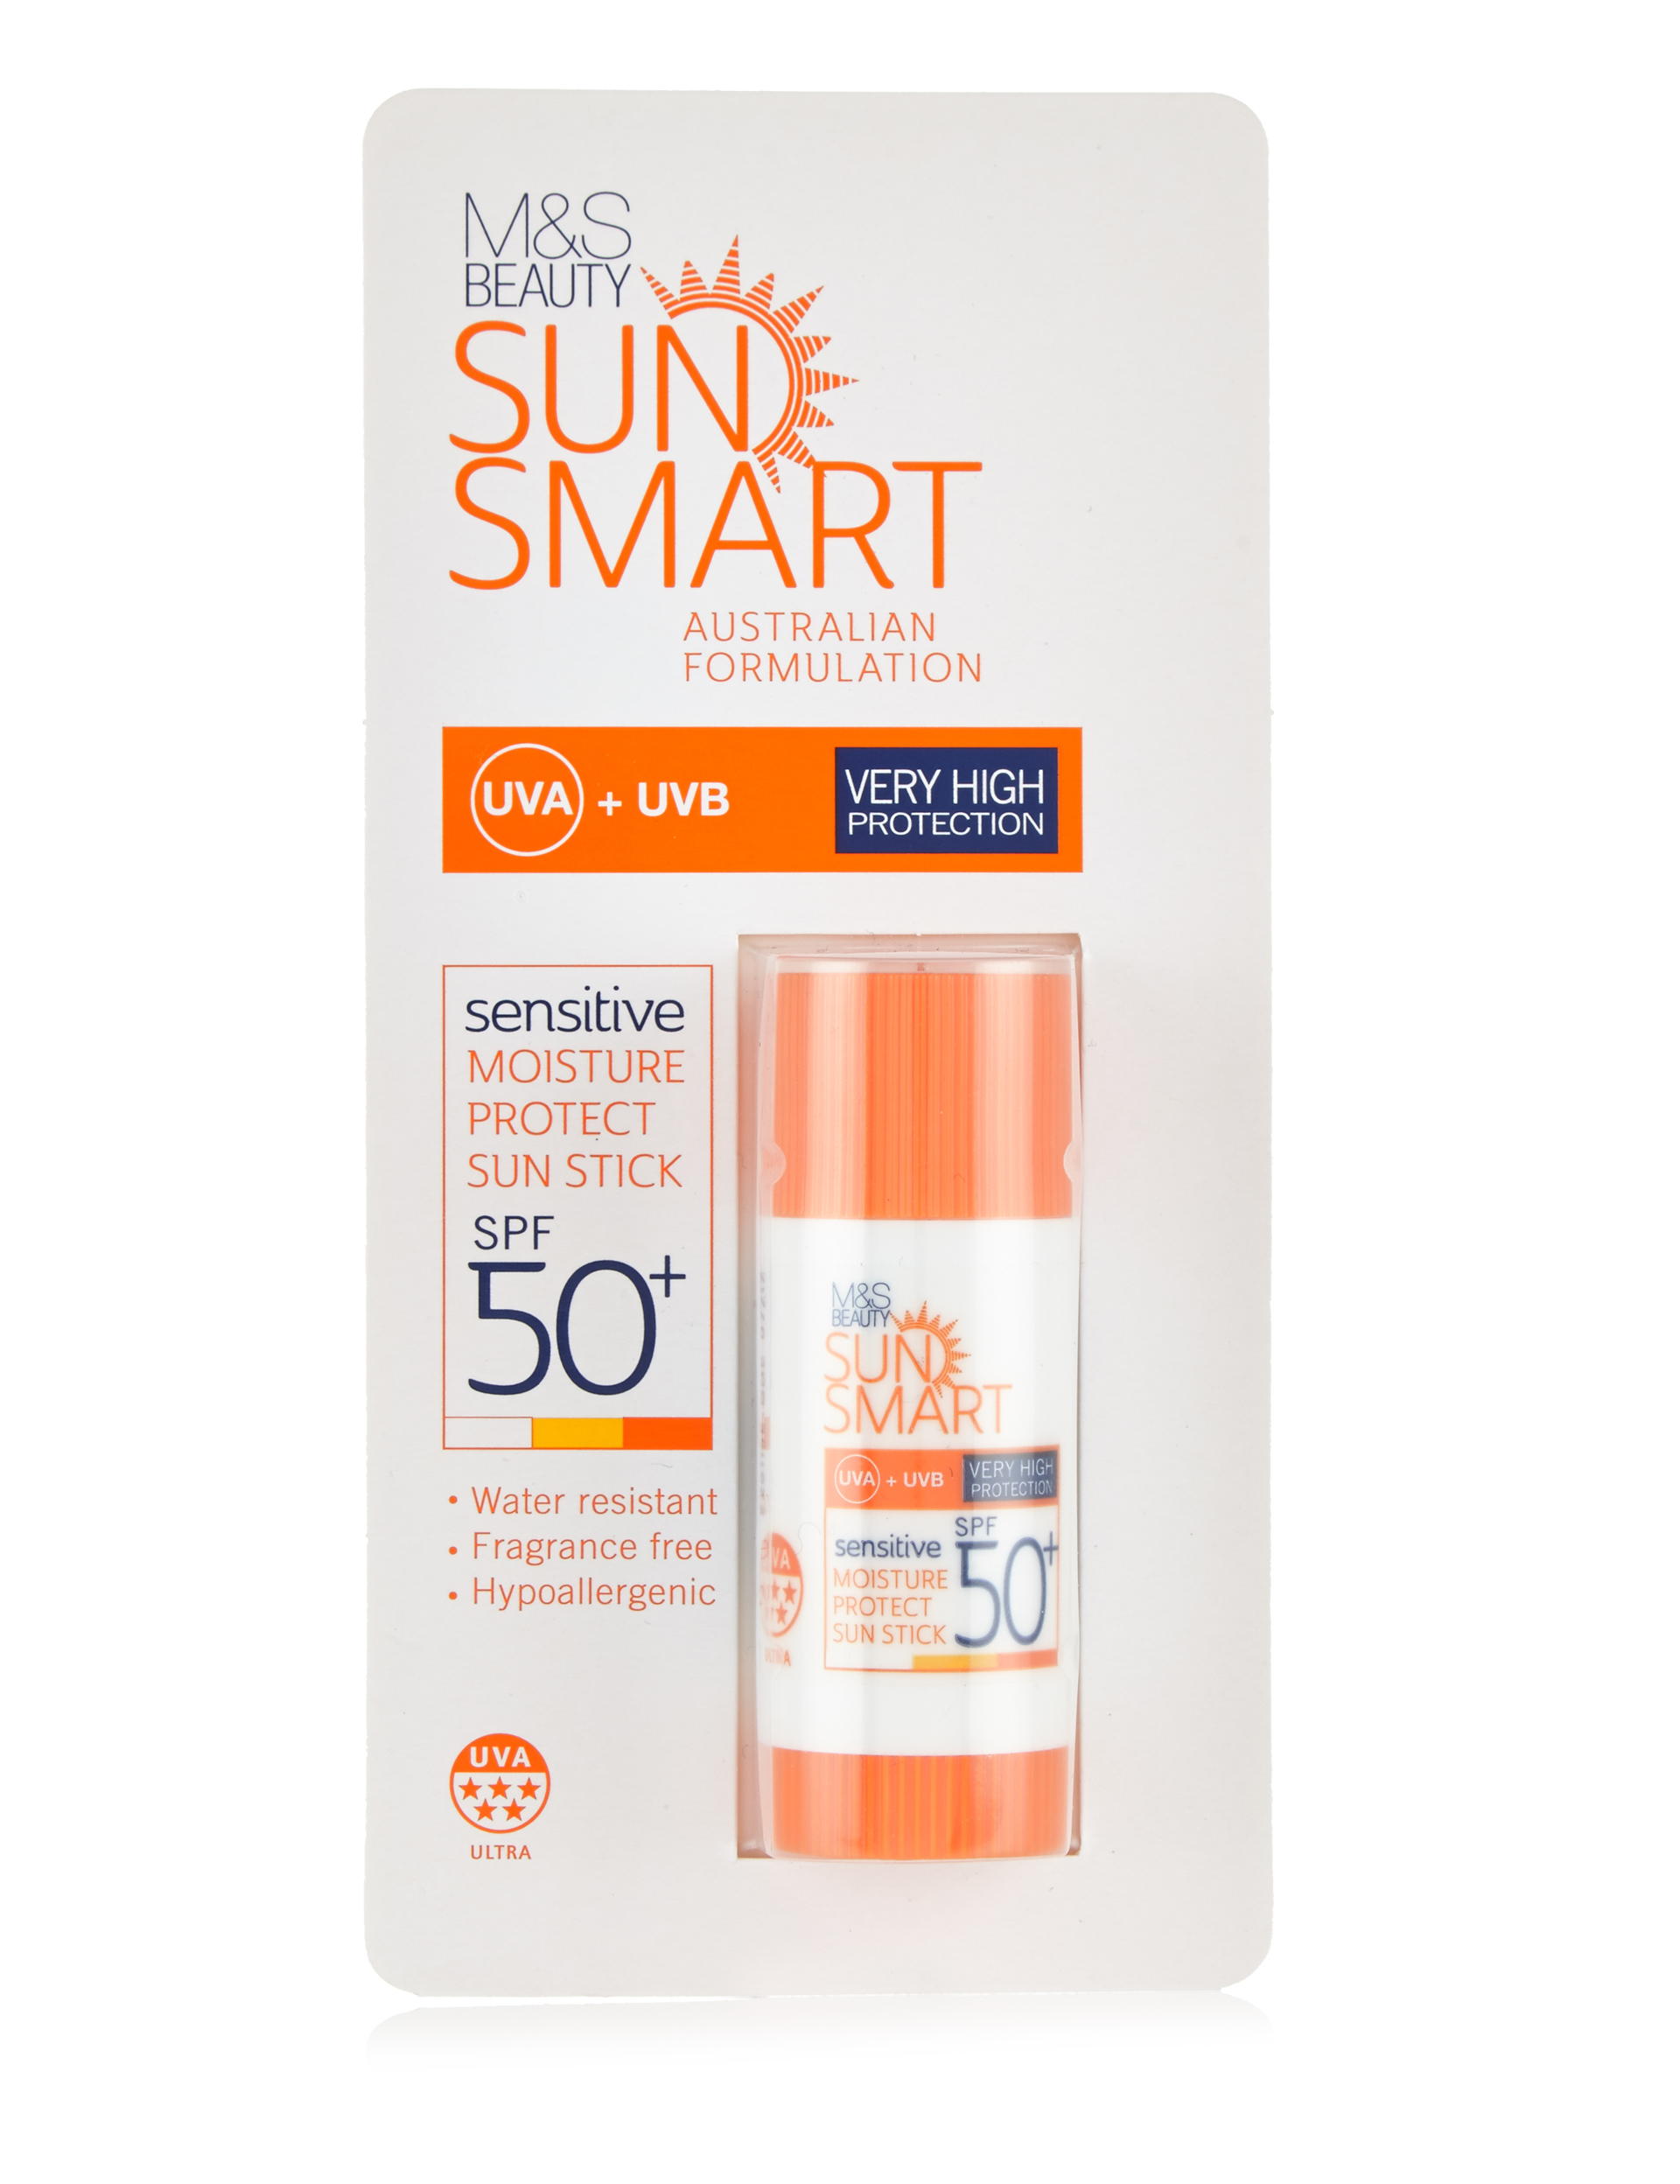 MARKS & SPENCER Sun Smart Sensitive Moisture Protect Sun Stick SPF 50+